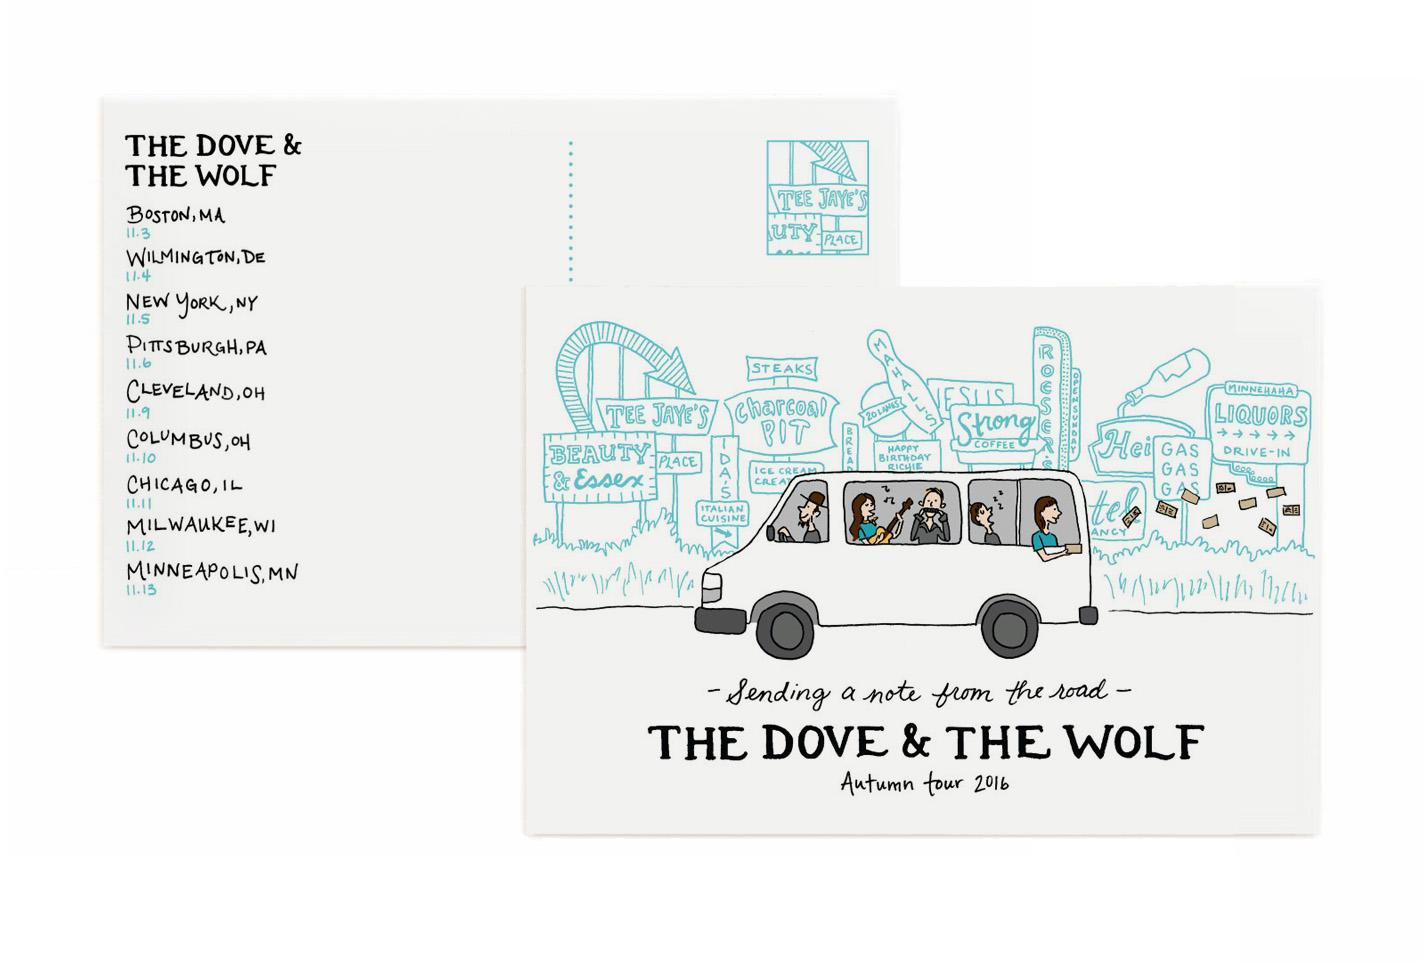 dove and wolf postcard.jpg